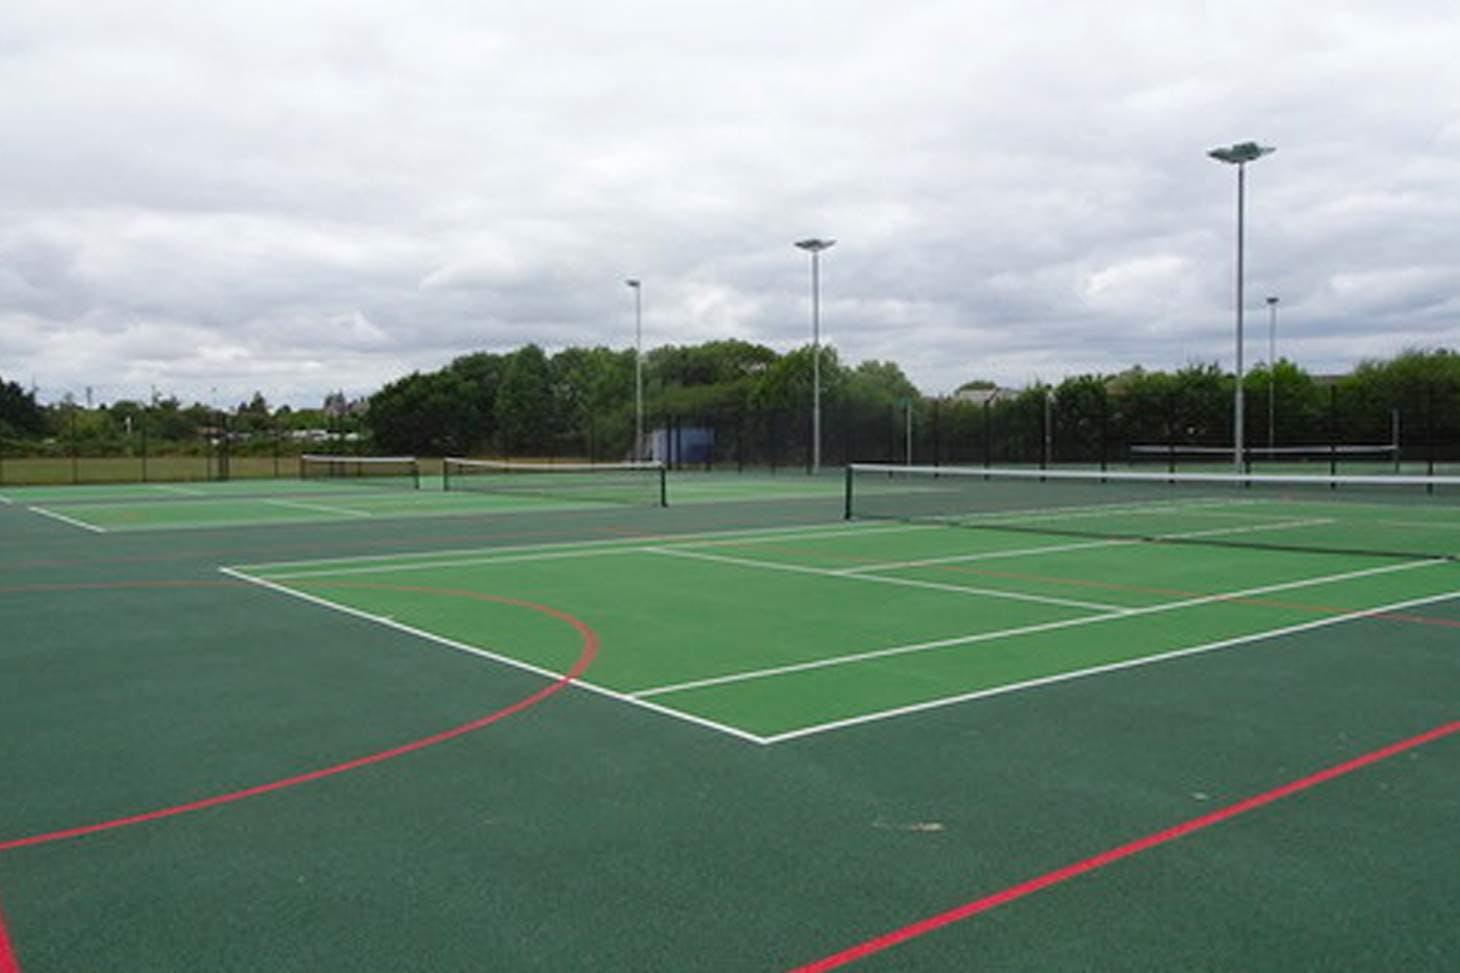 Trevelyan Middle School Outdoor | Hard (macadam) tennis court